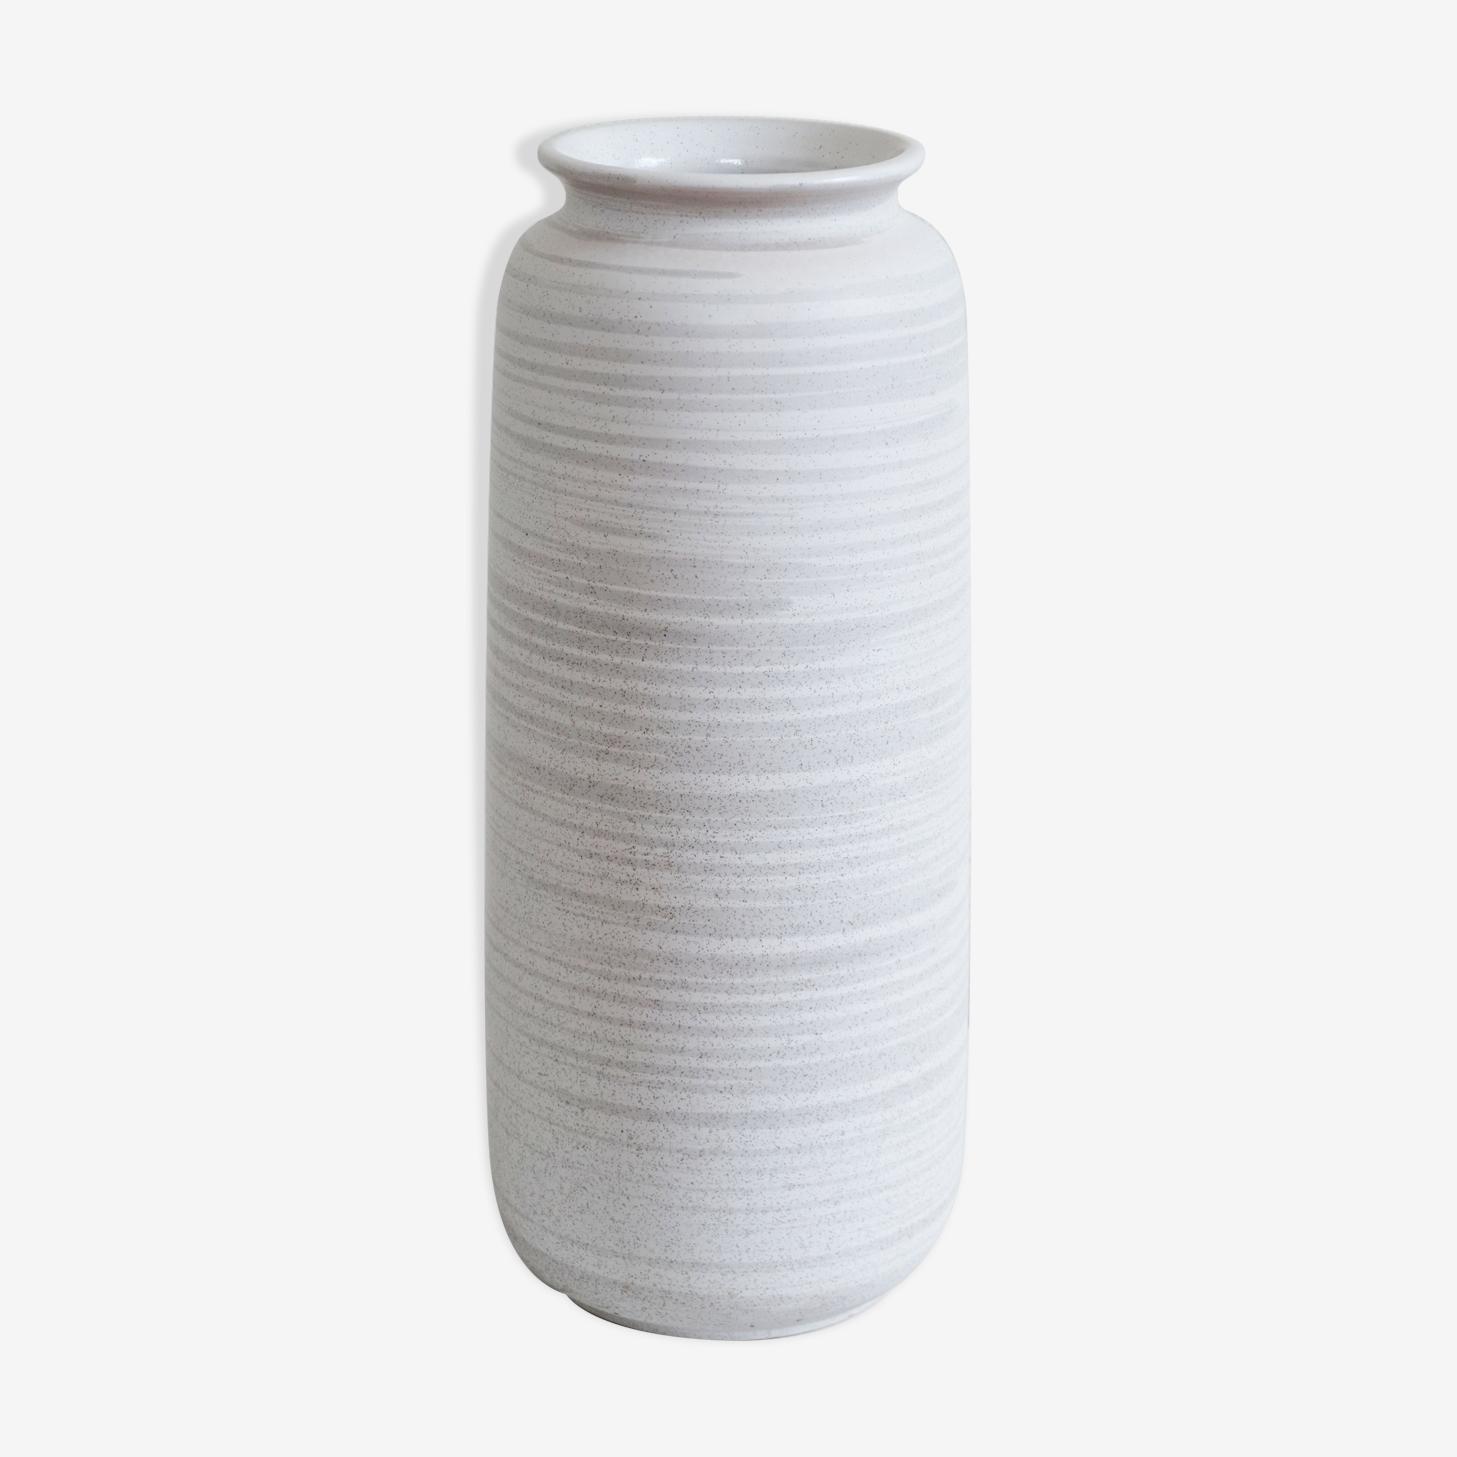 Vase blanc en céramique west germany